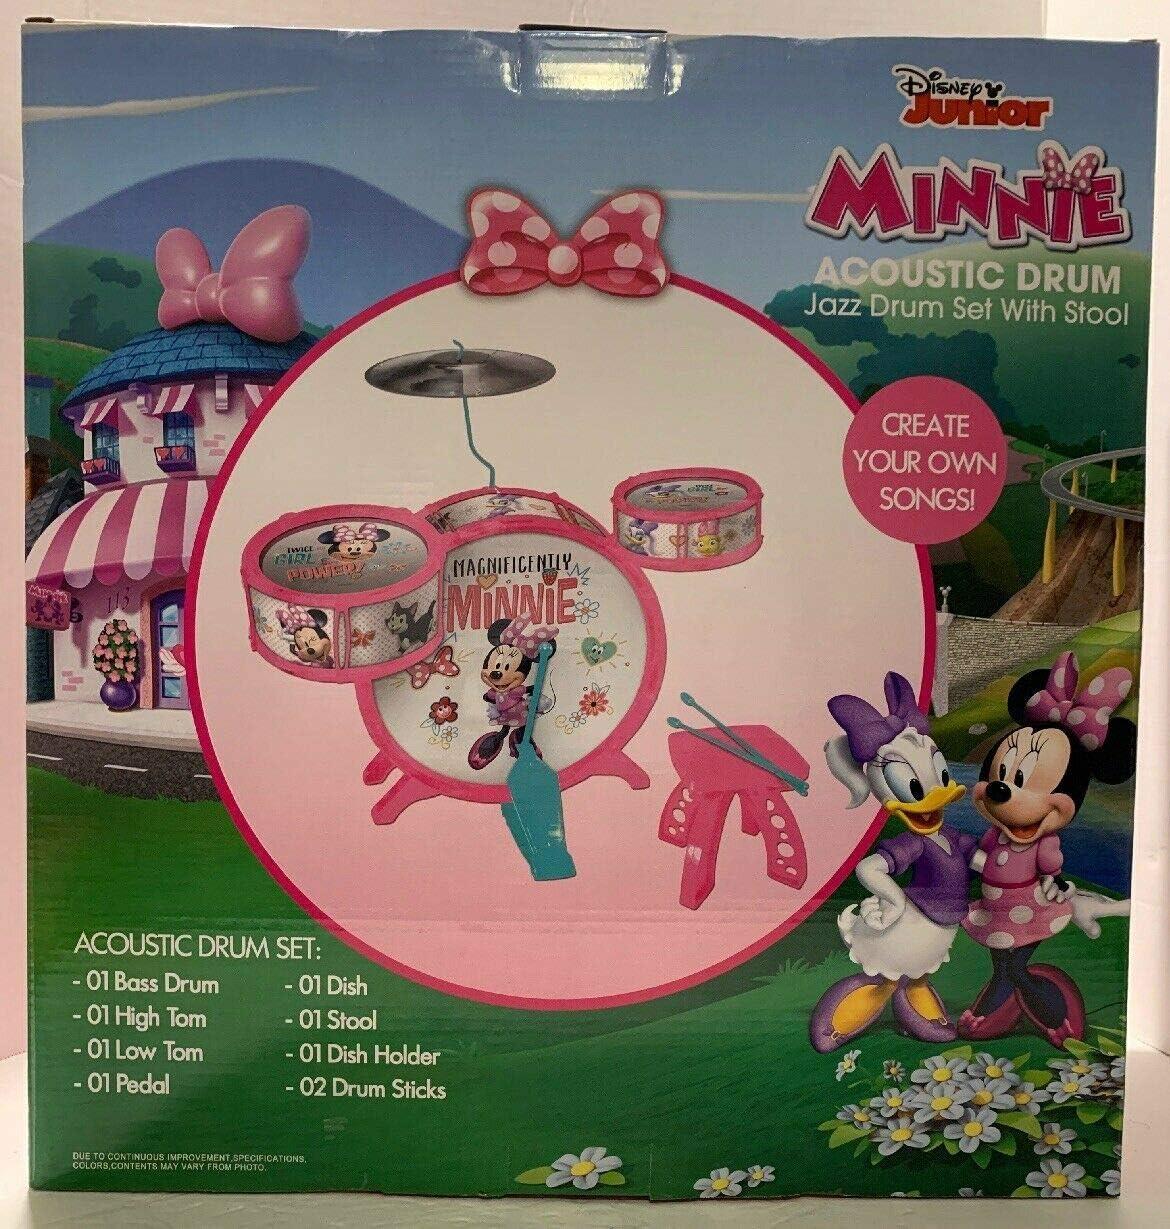 Disney Junior Minnie Mouse Jazz Drum Set with Stool